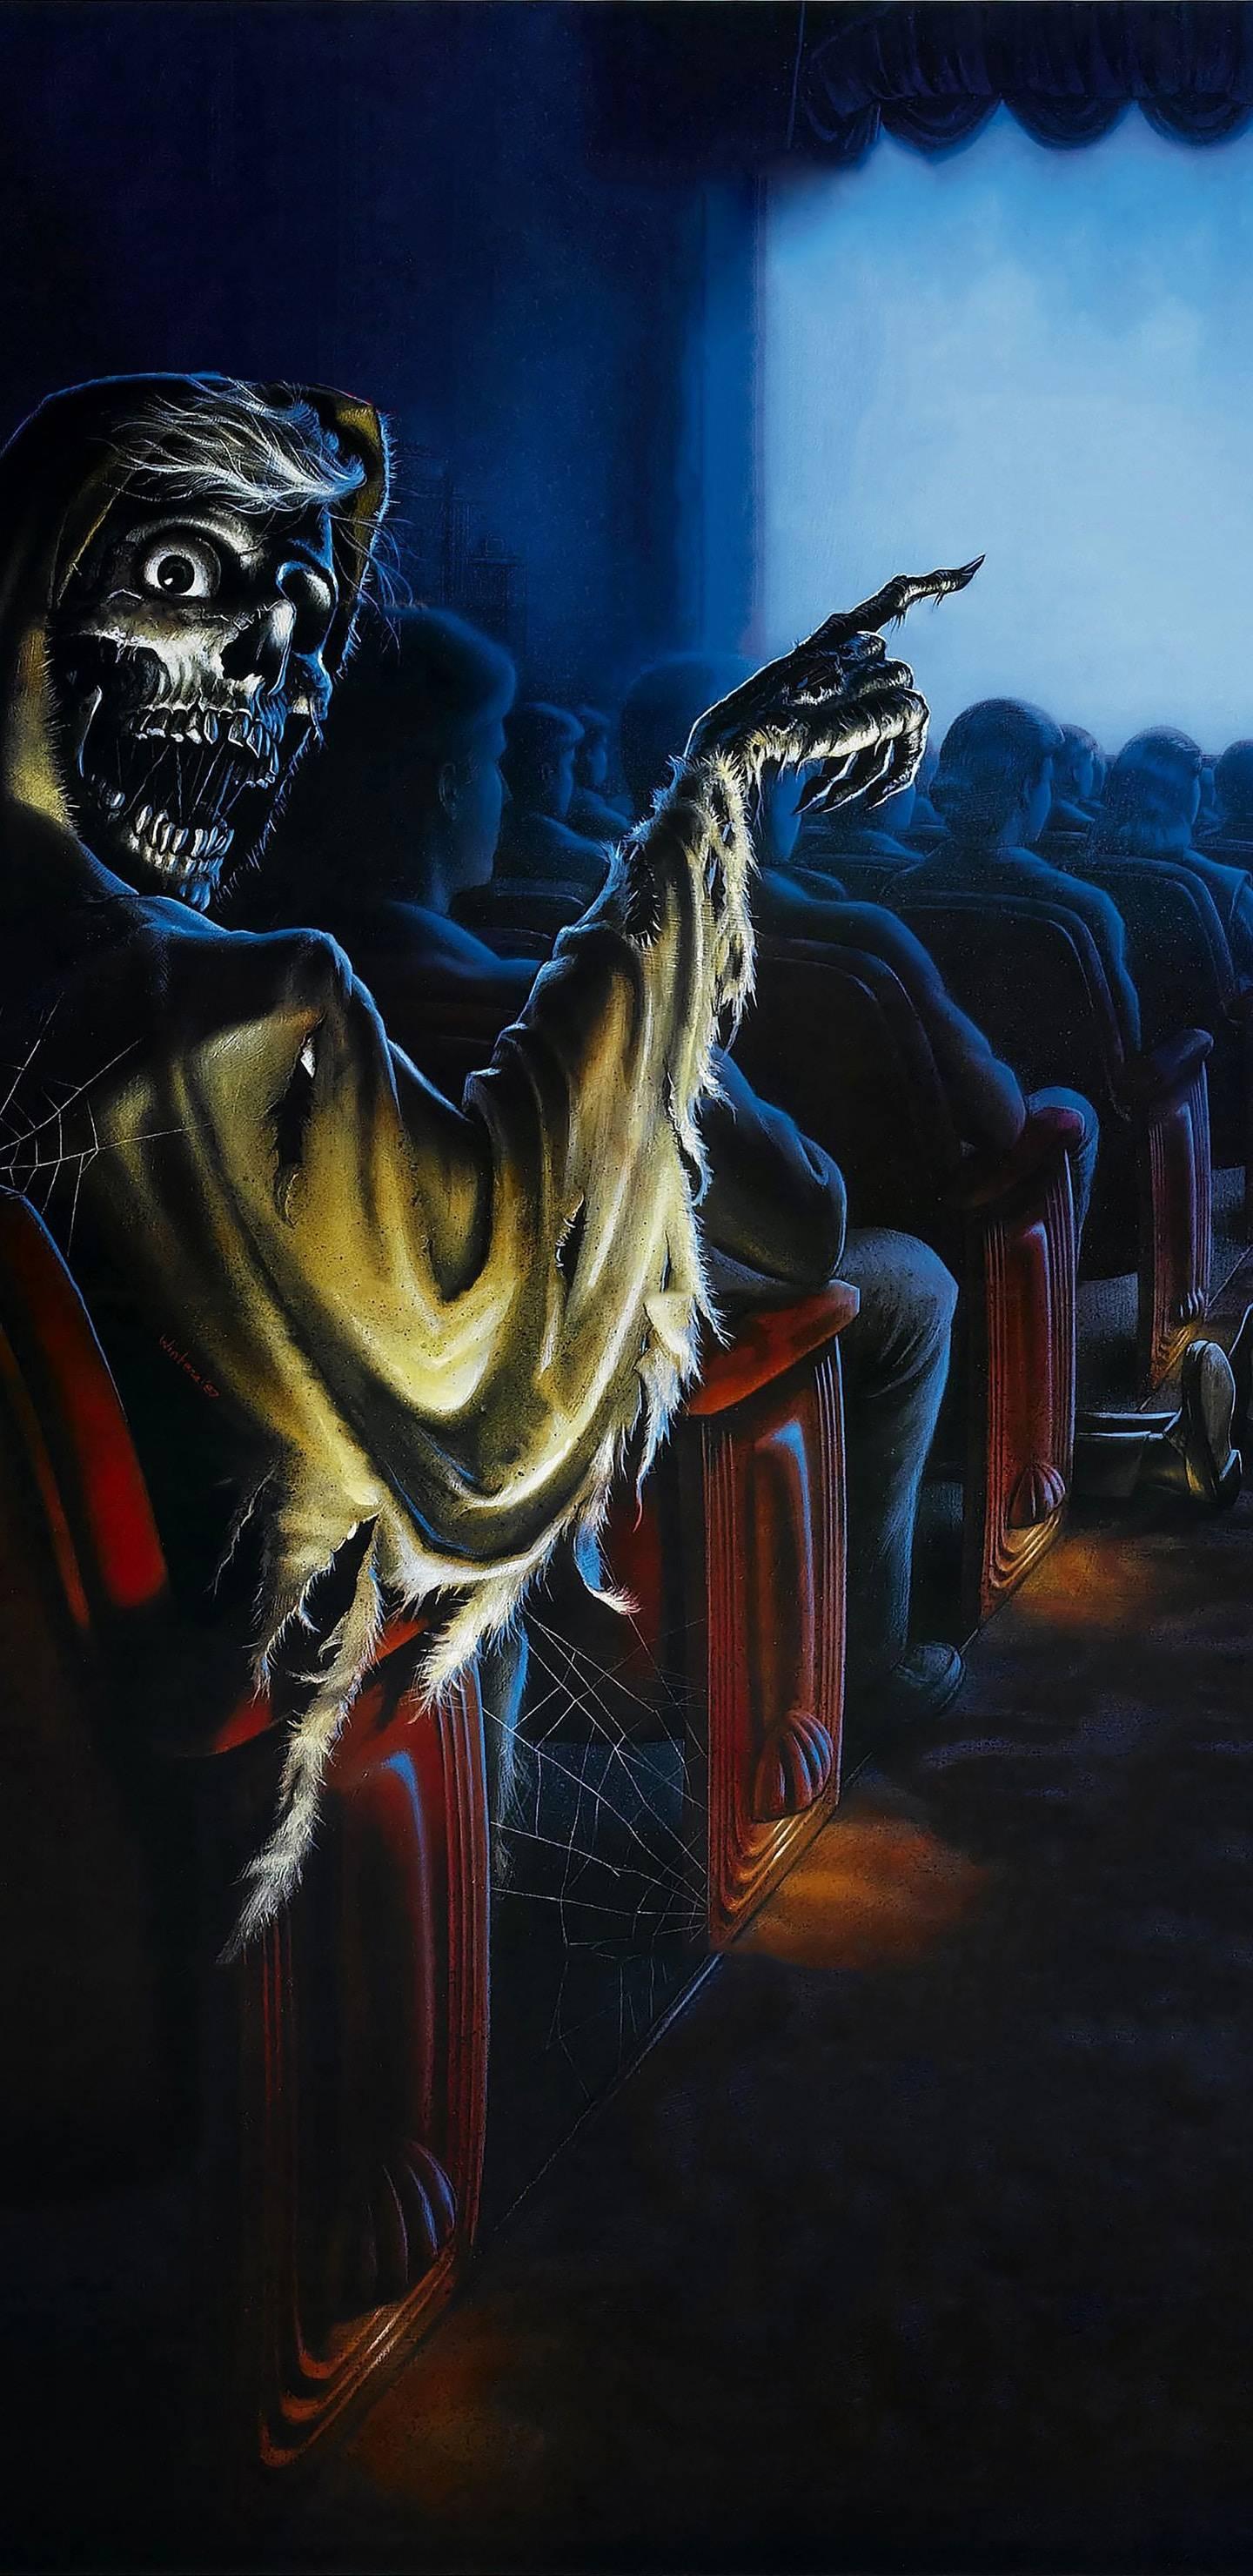 Creepshow-743b251d-18fc-498a-9666-16eb97193c84.jpg